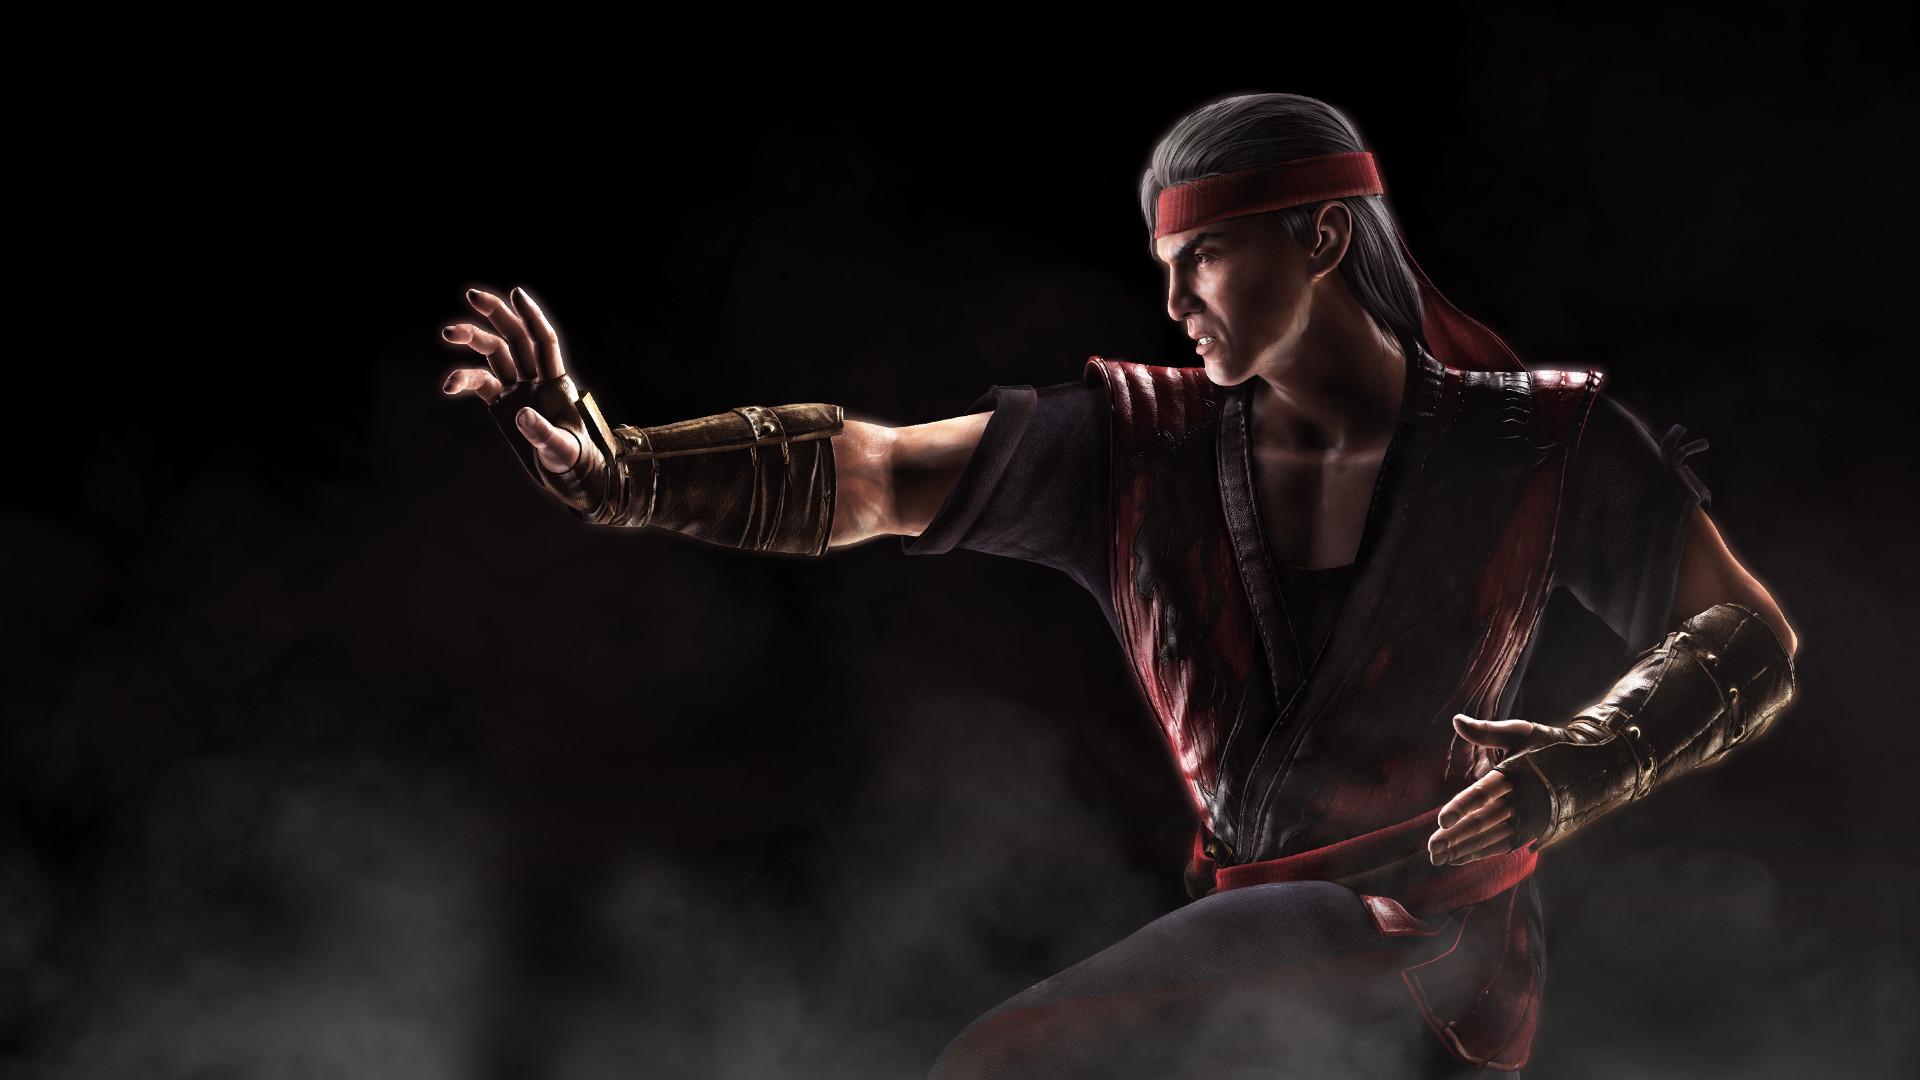 Liu Kang Mortal Kombat X